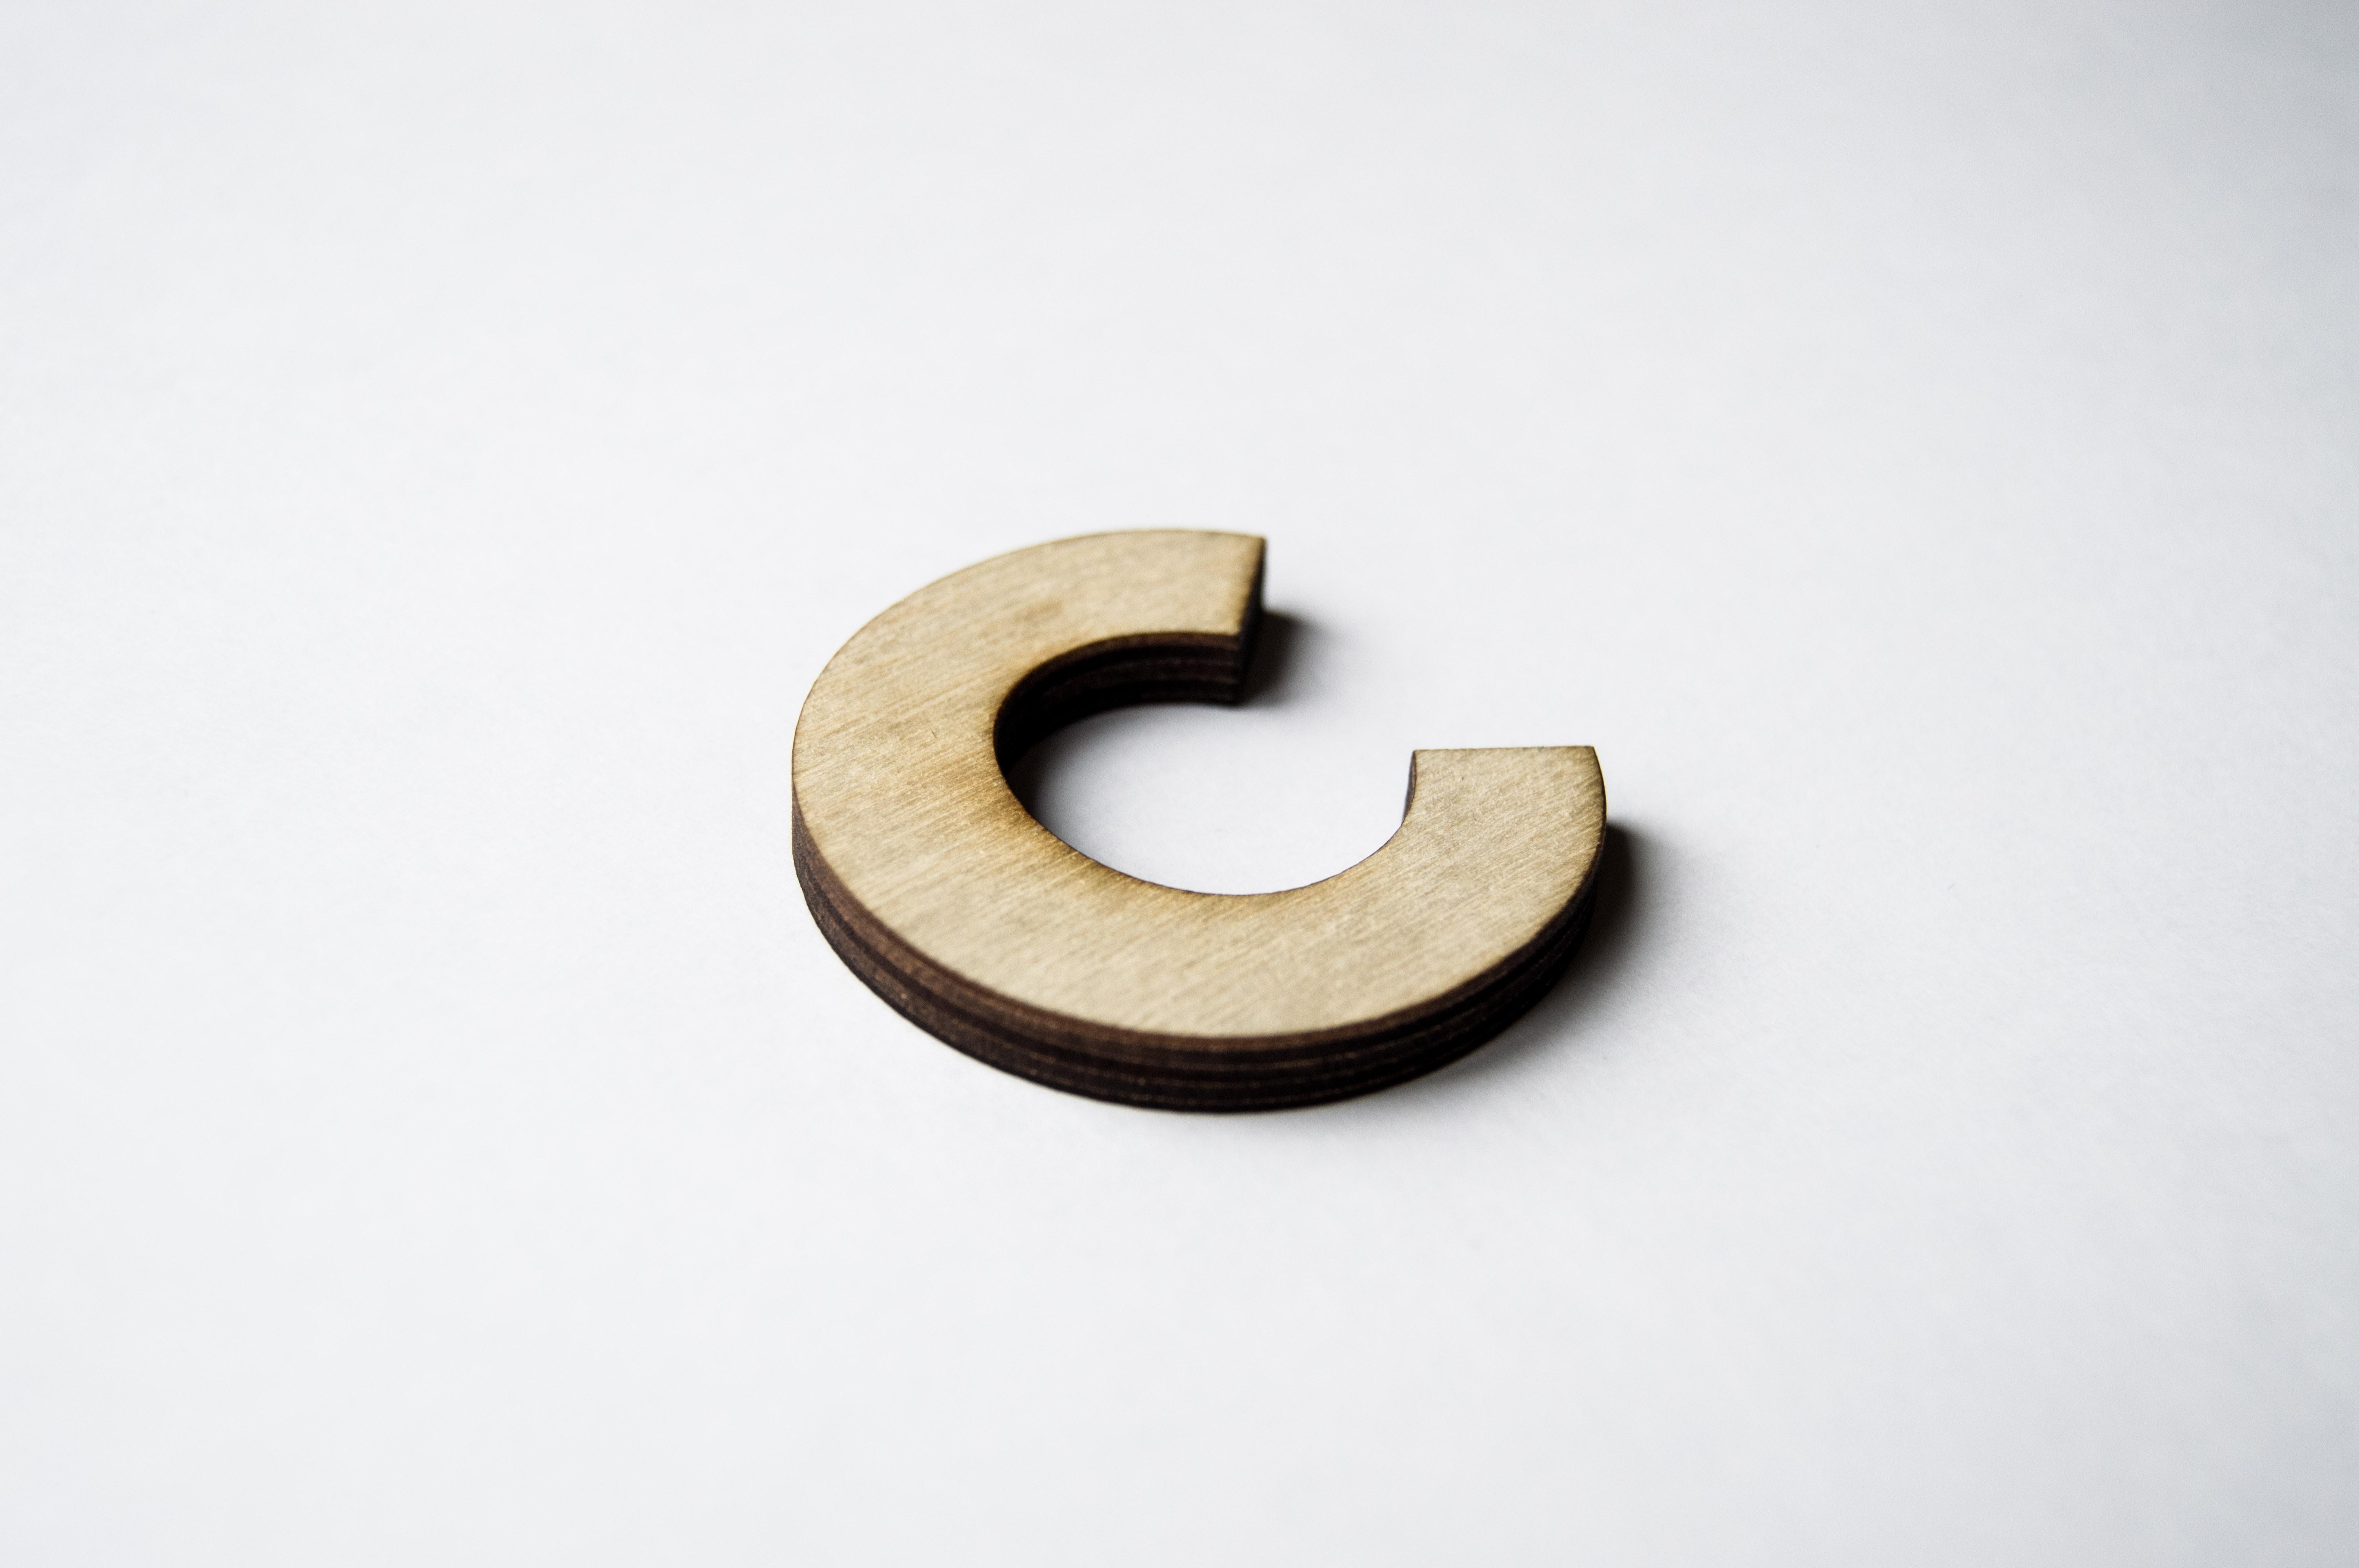 brown wooden letter c decor